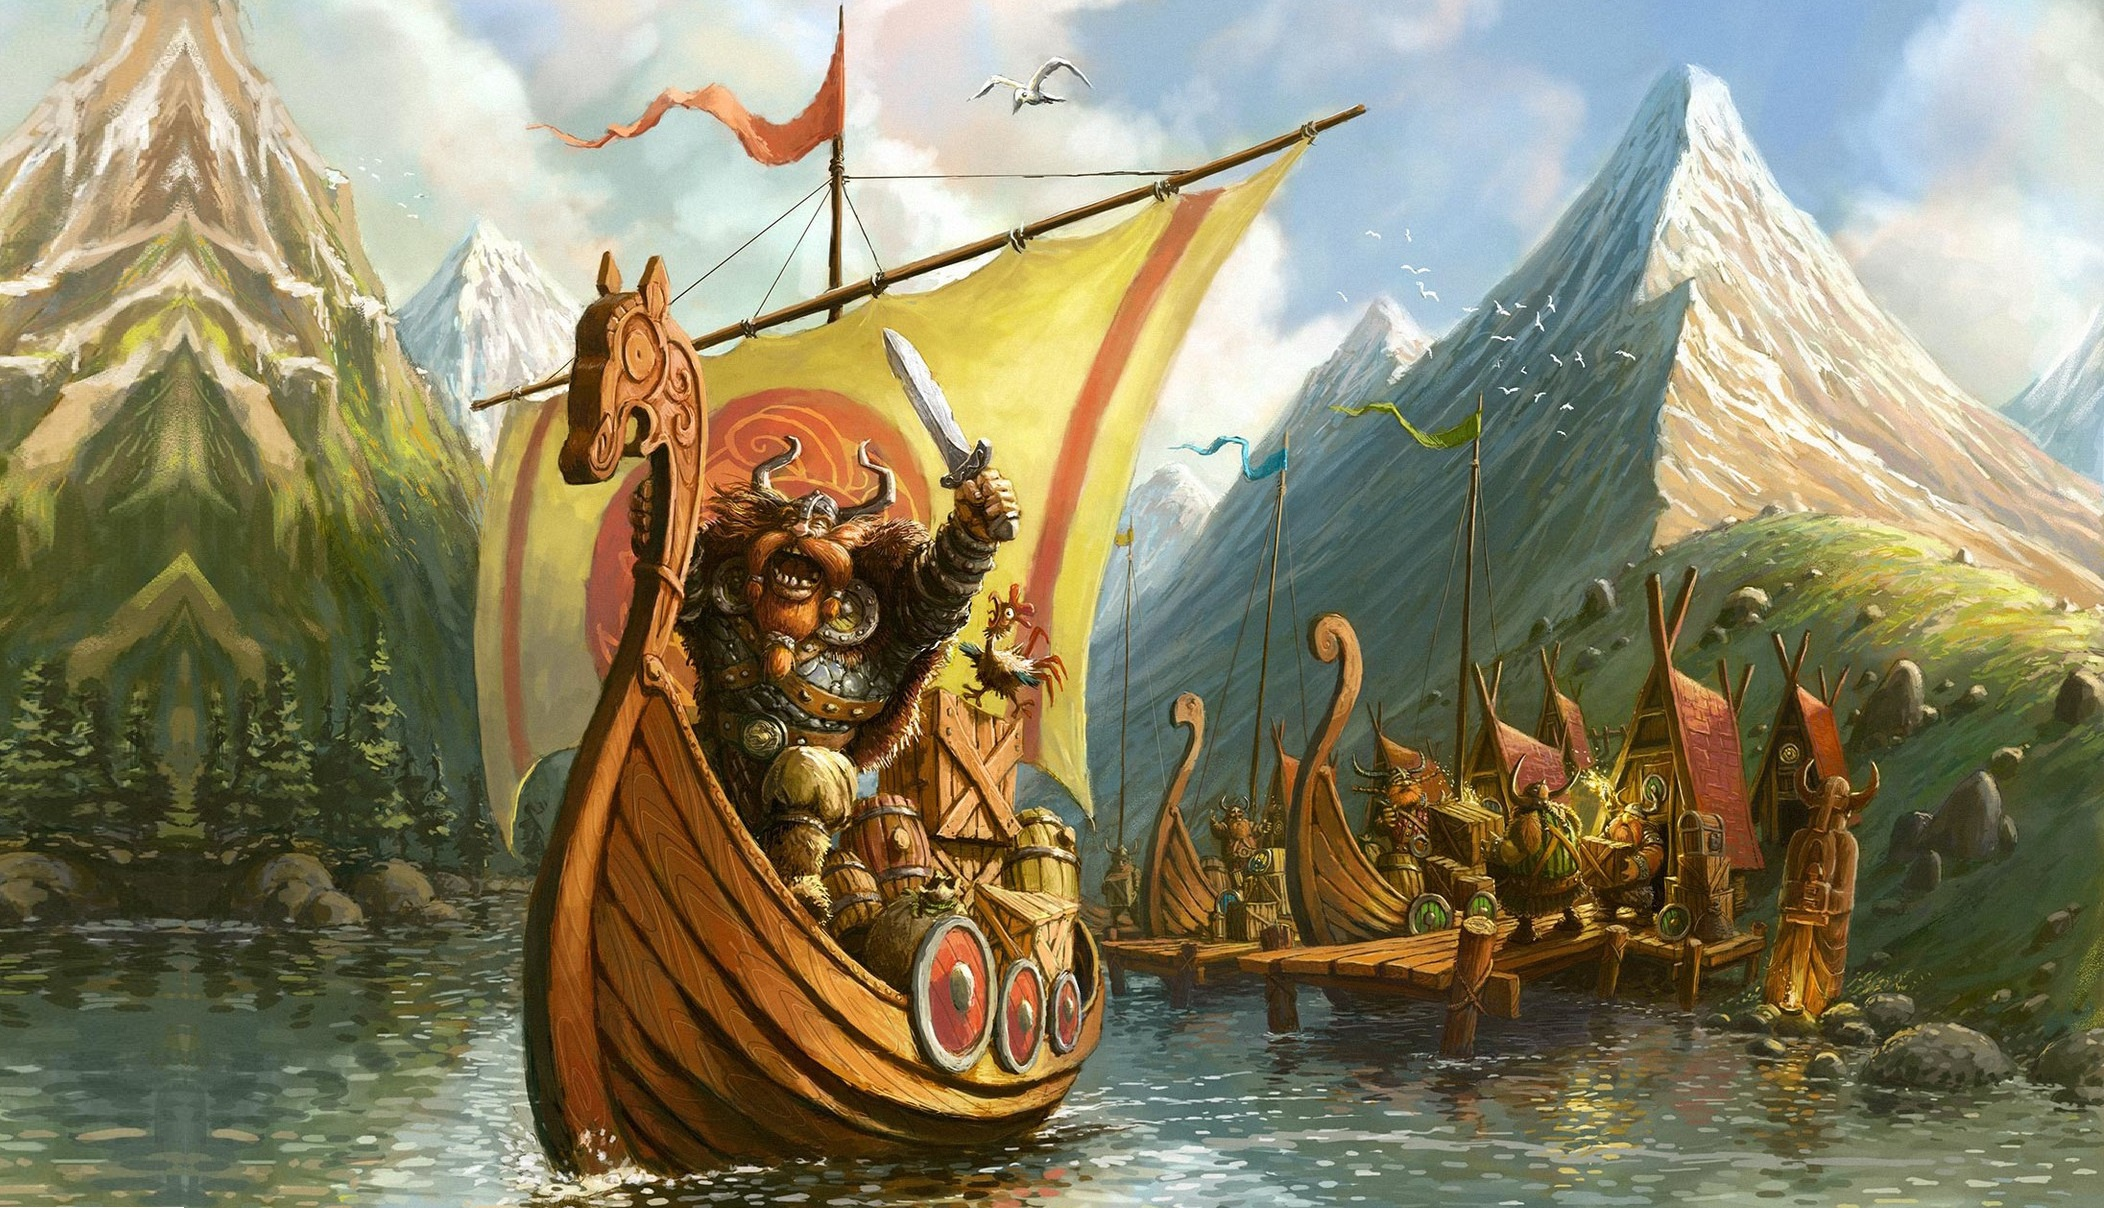 Viking HD Wallpaper | Background Image | 2104x1208 | ID ...